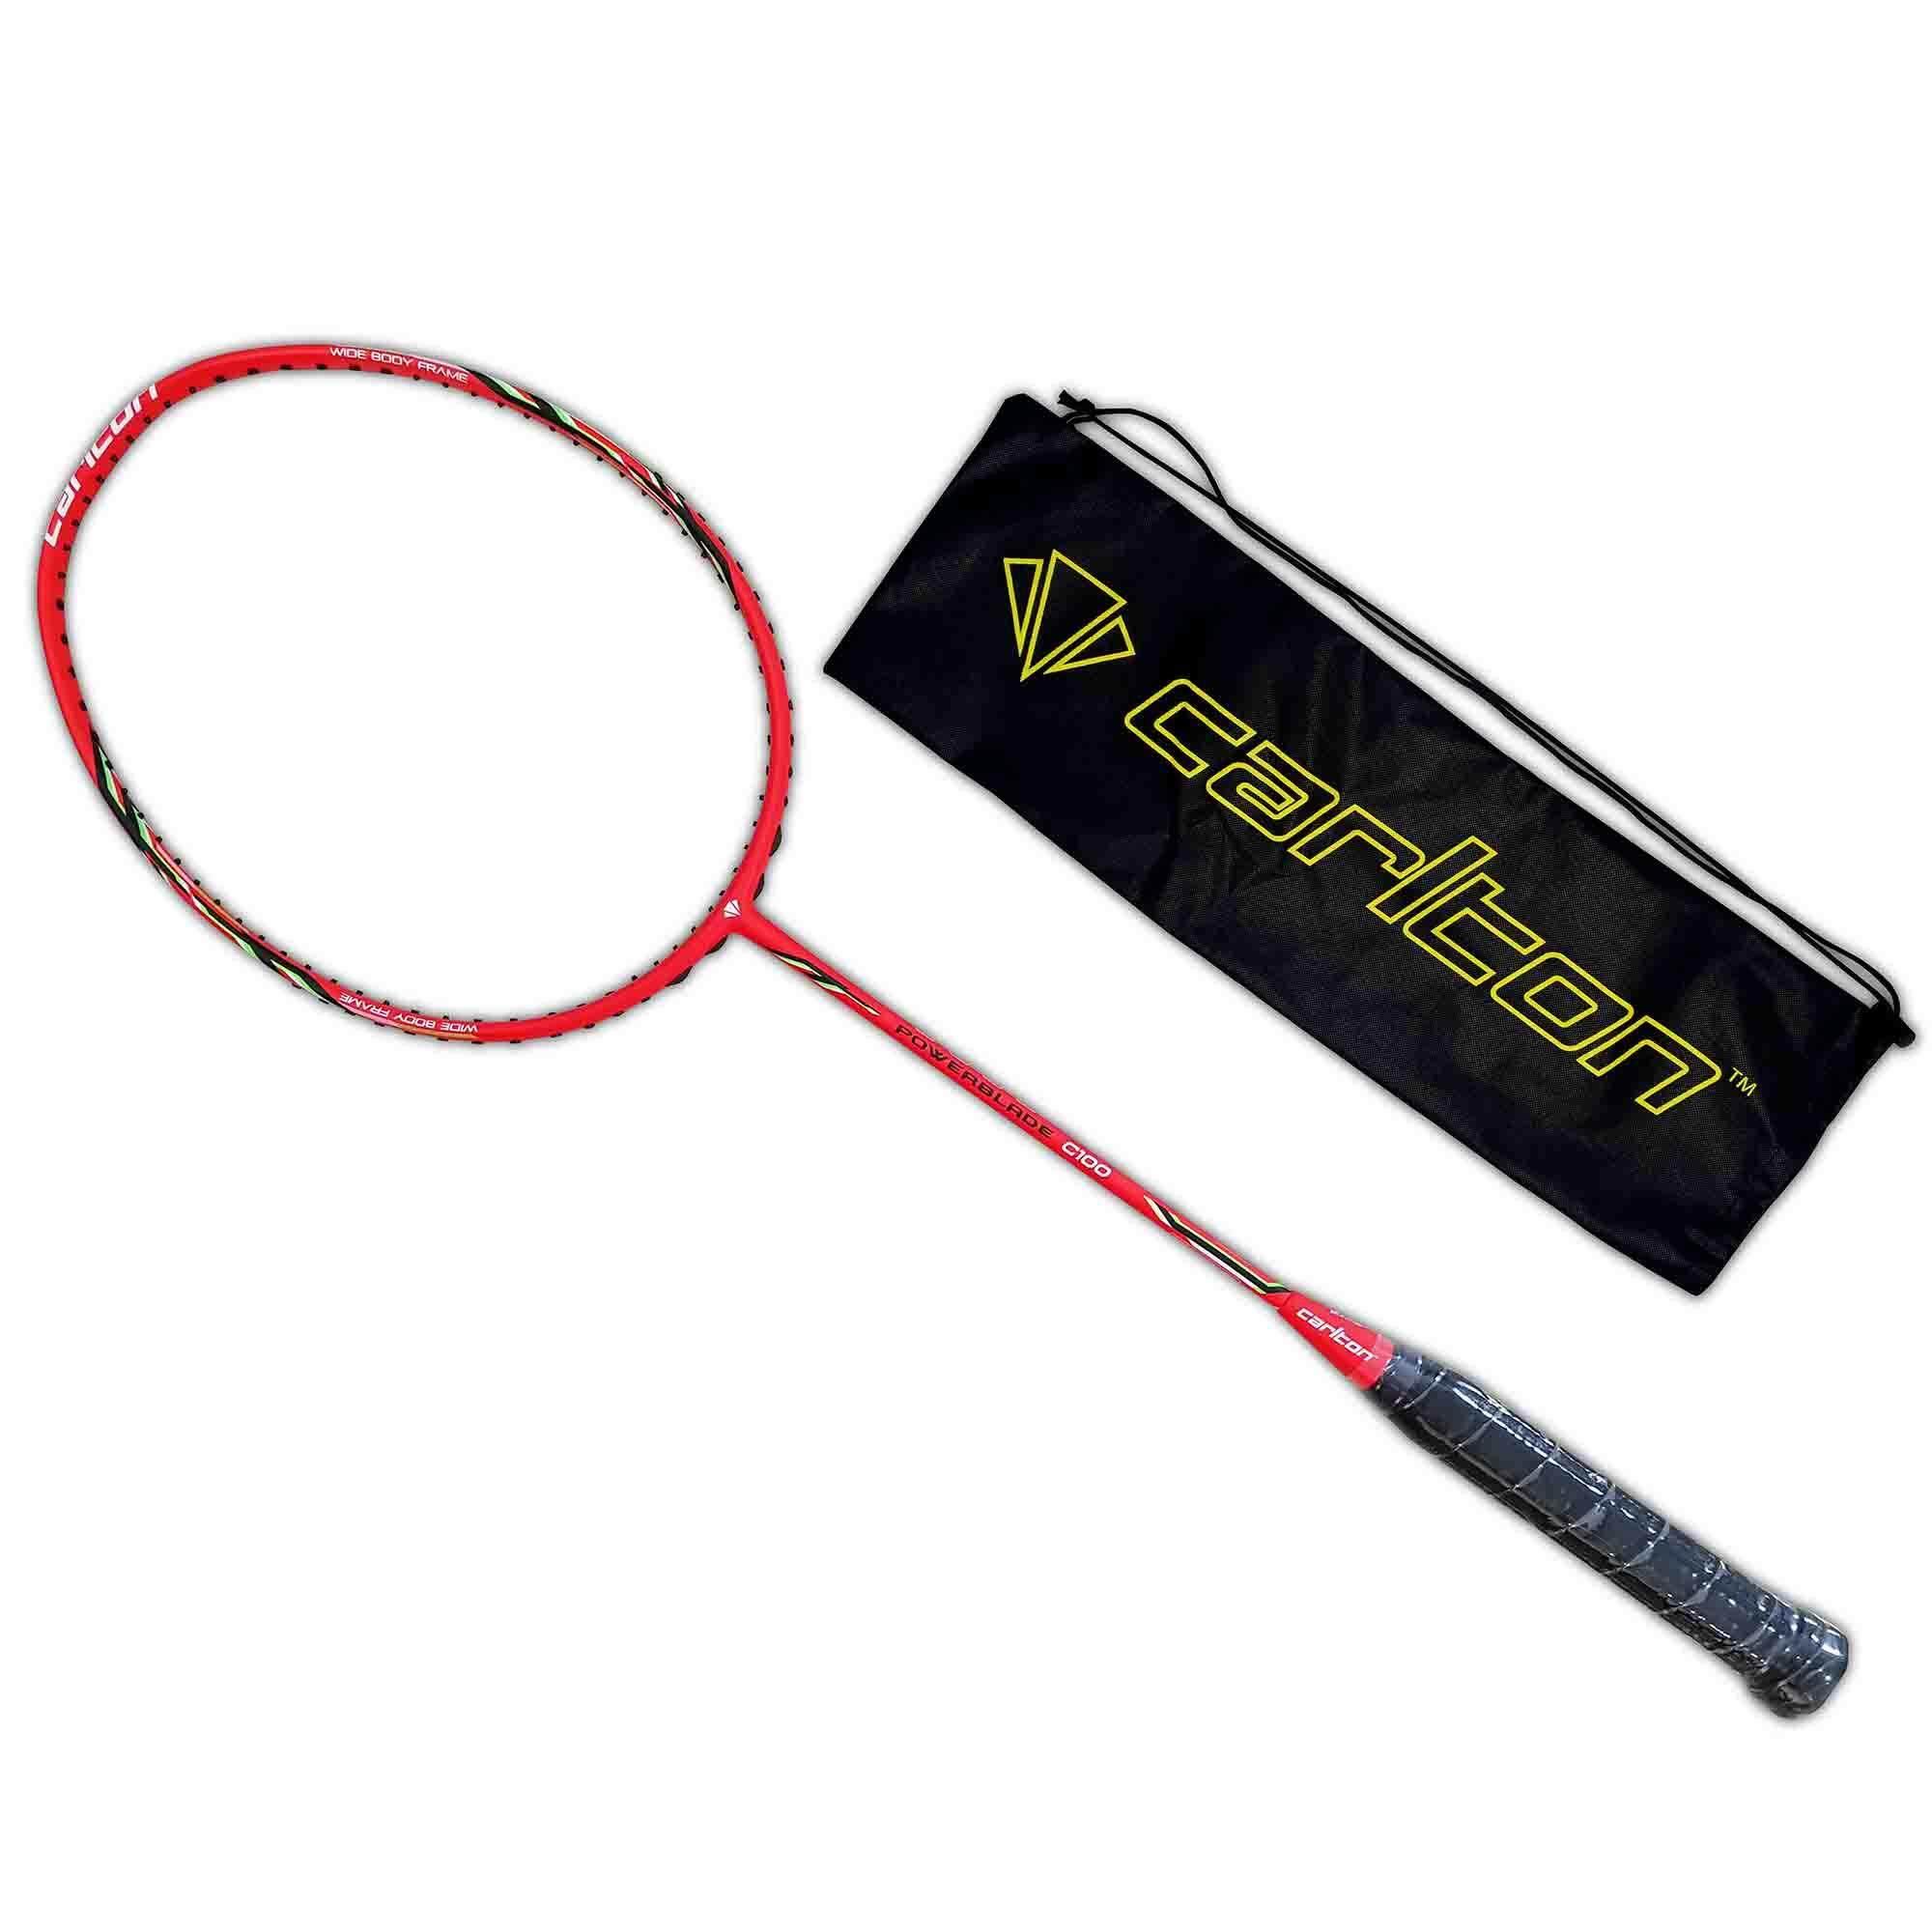 Carlton Badminton Racket Powerblade C 100